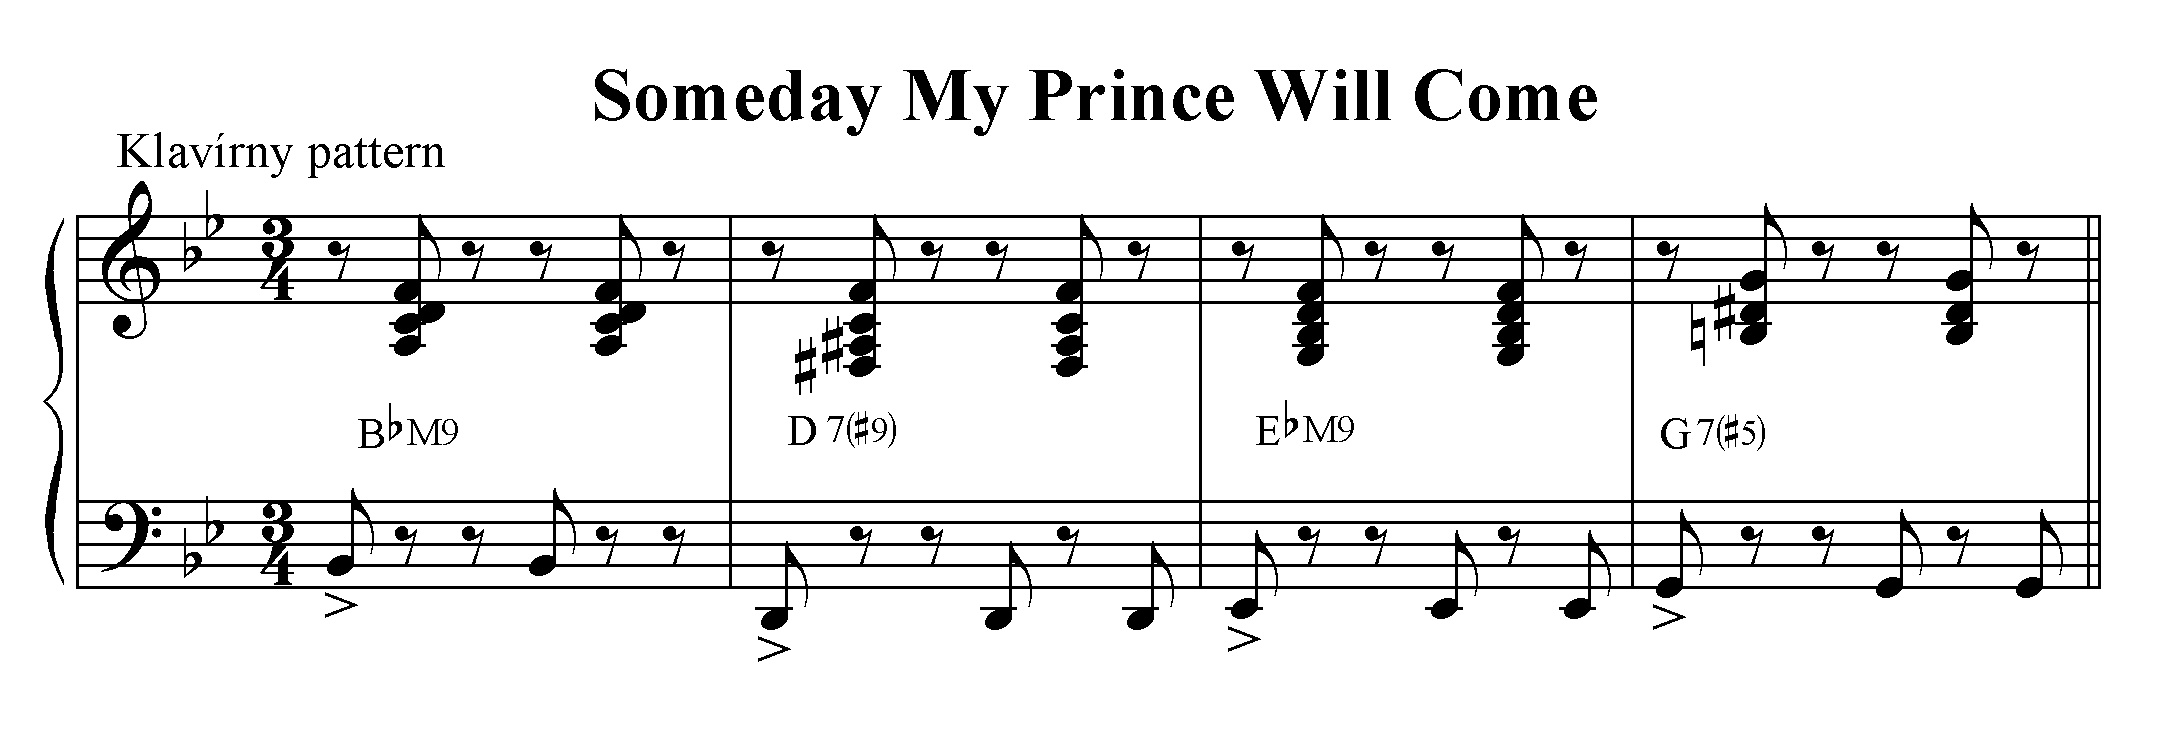 Gabriel jon slovak jazz pianist musicologica day my prince will come dimitrov4somedaymy hexwebz Choice Image